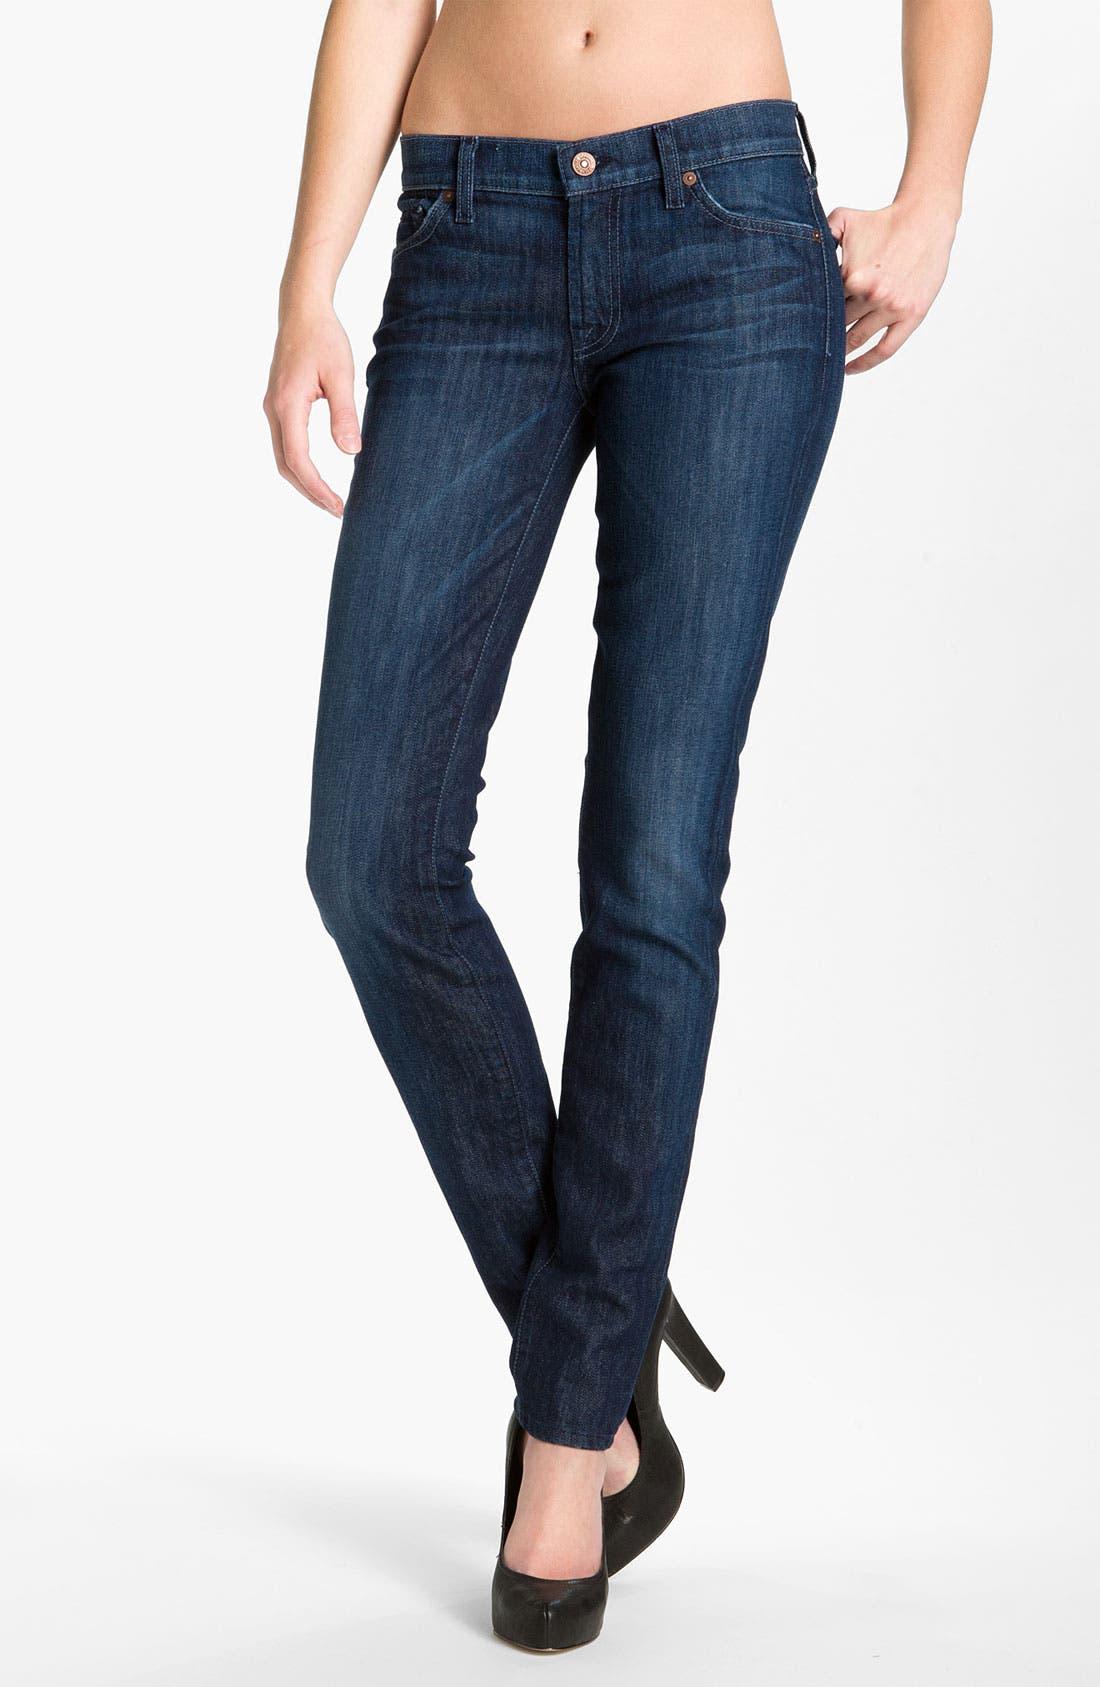 Alternate Image 1 Selected - 7 For All Mankind® 'Roxanne' Skinny Jeans (Summer Dusk)